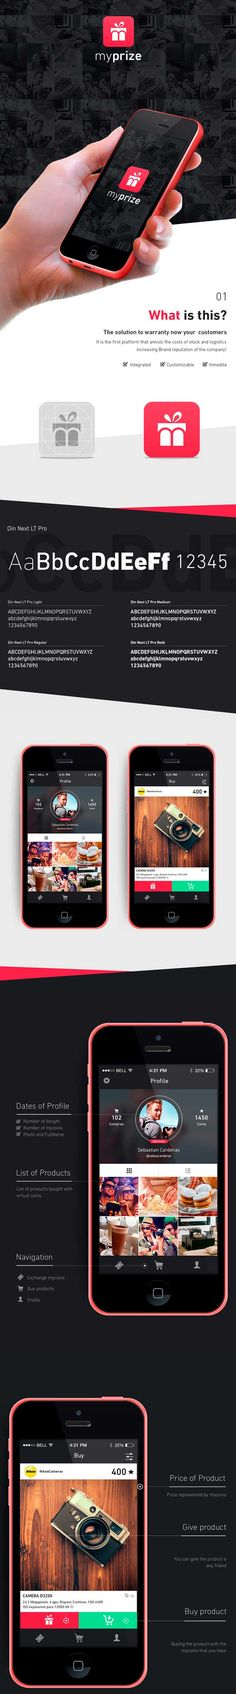 Myprize  ios smartphone app